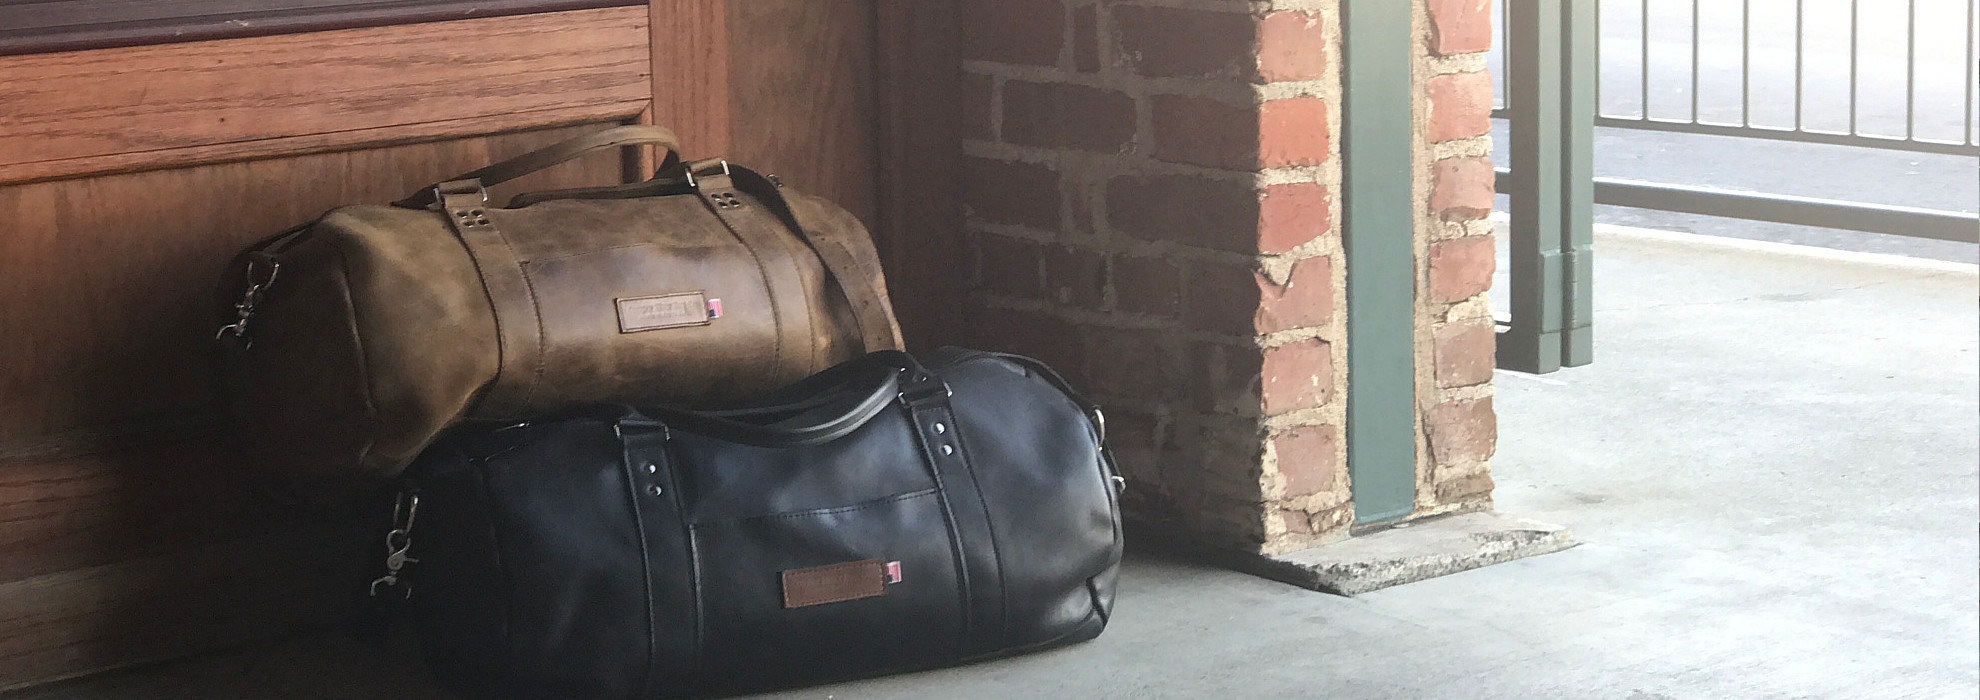 copper-river-bag-co-banner-duffel-bags-.jpg